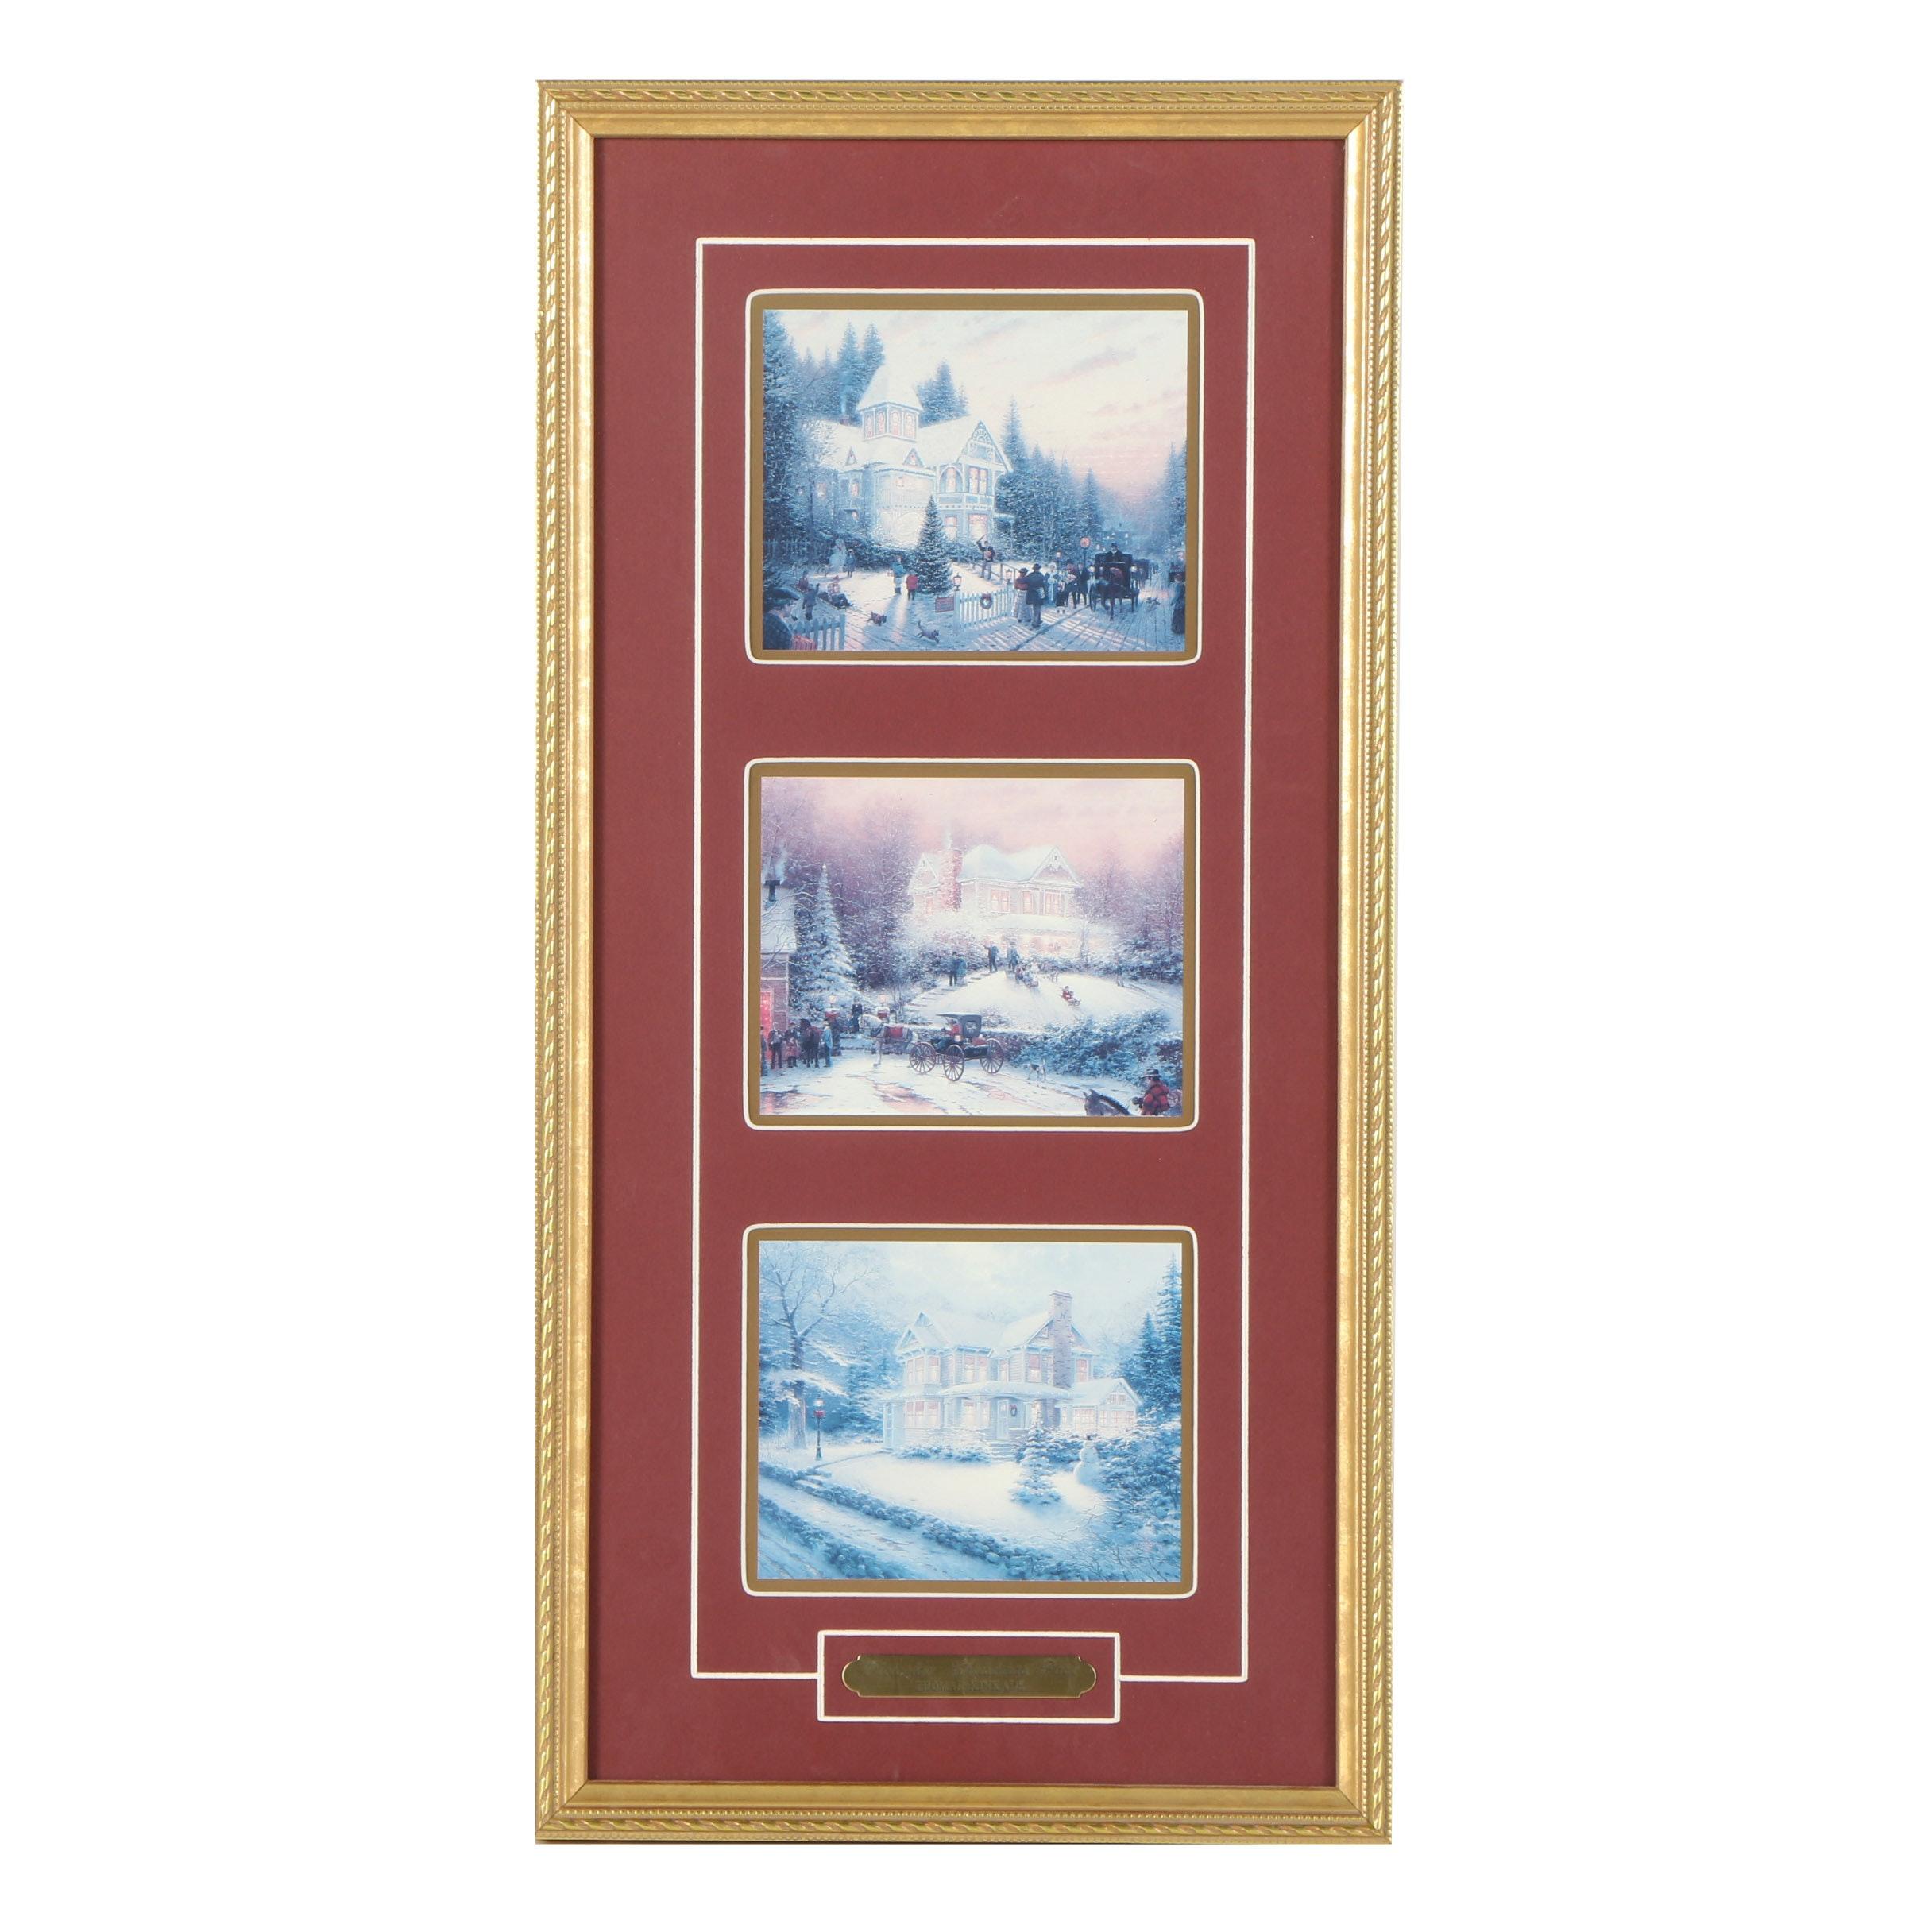 "Thomas Kinkade Offset Lithograph ""Victorian Christmas Past"""